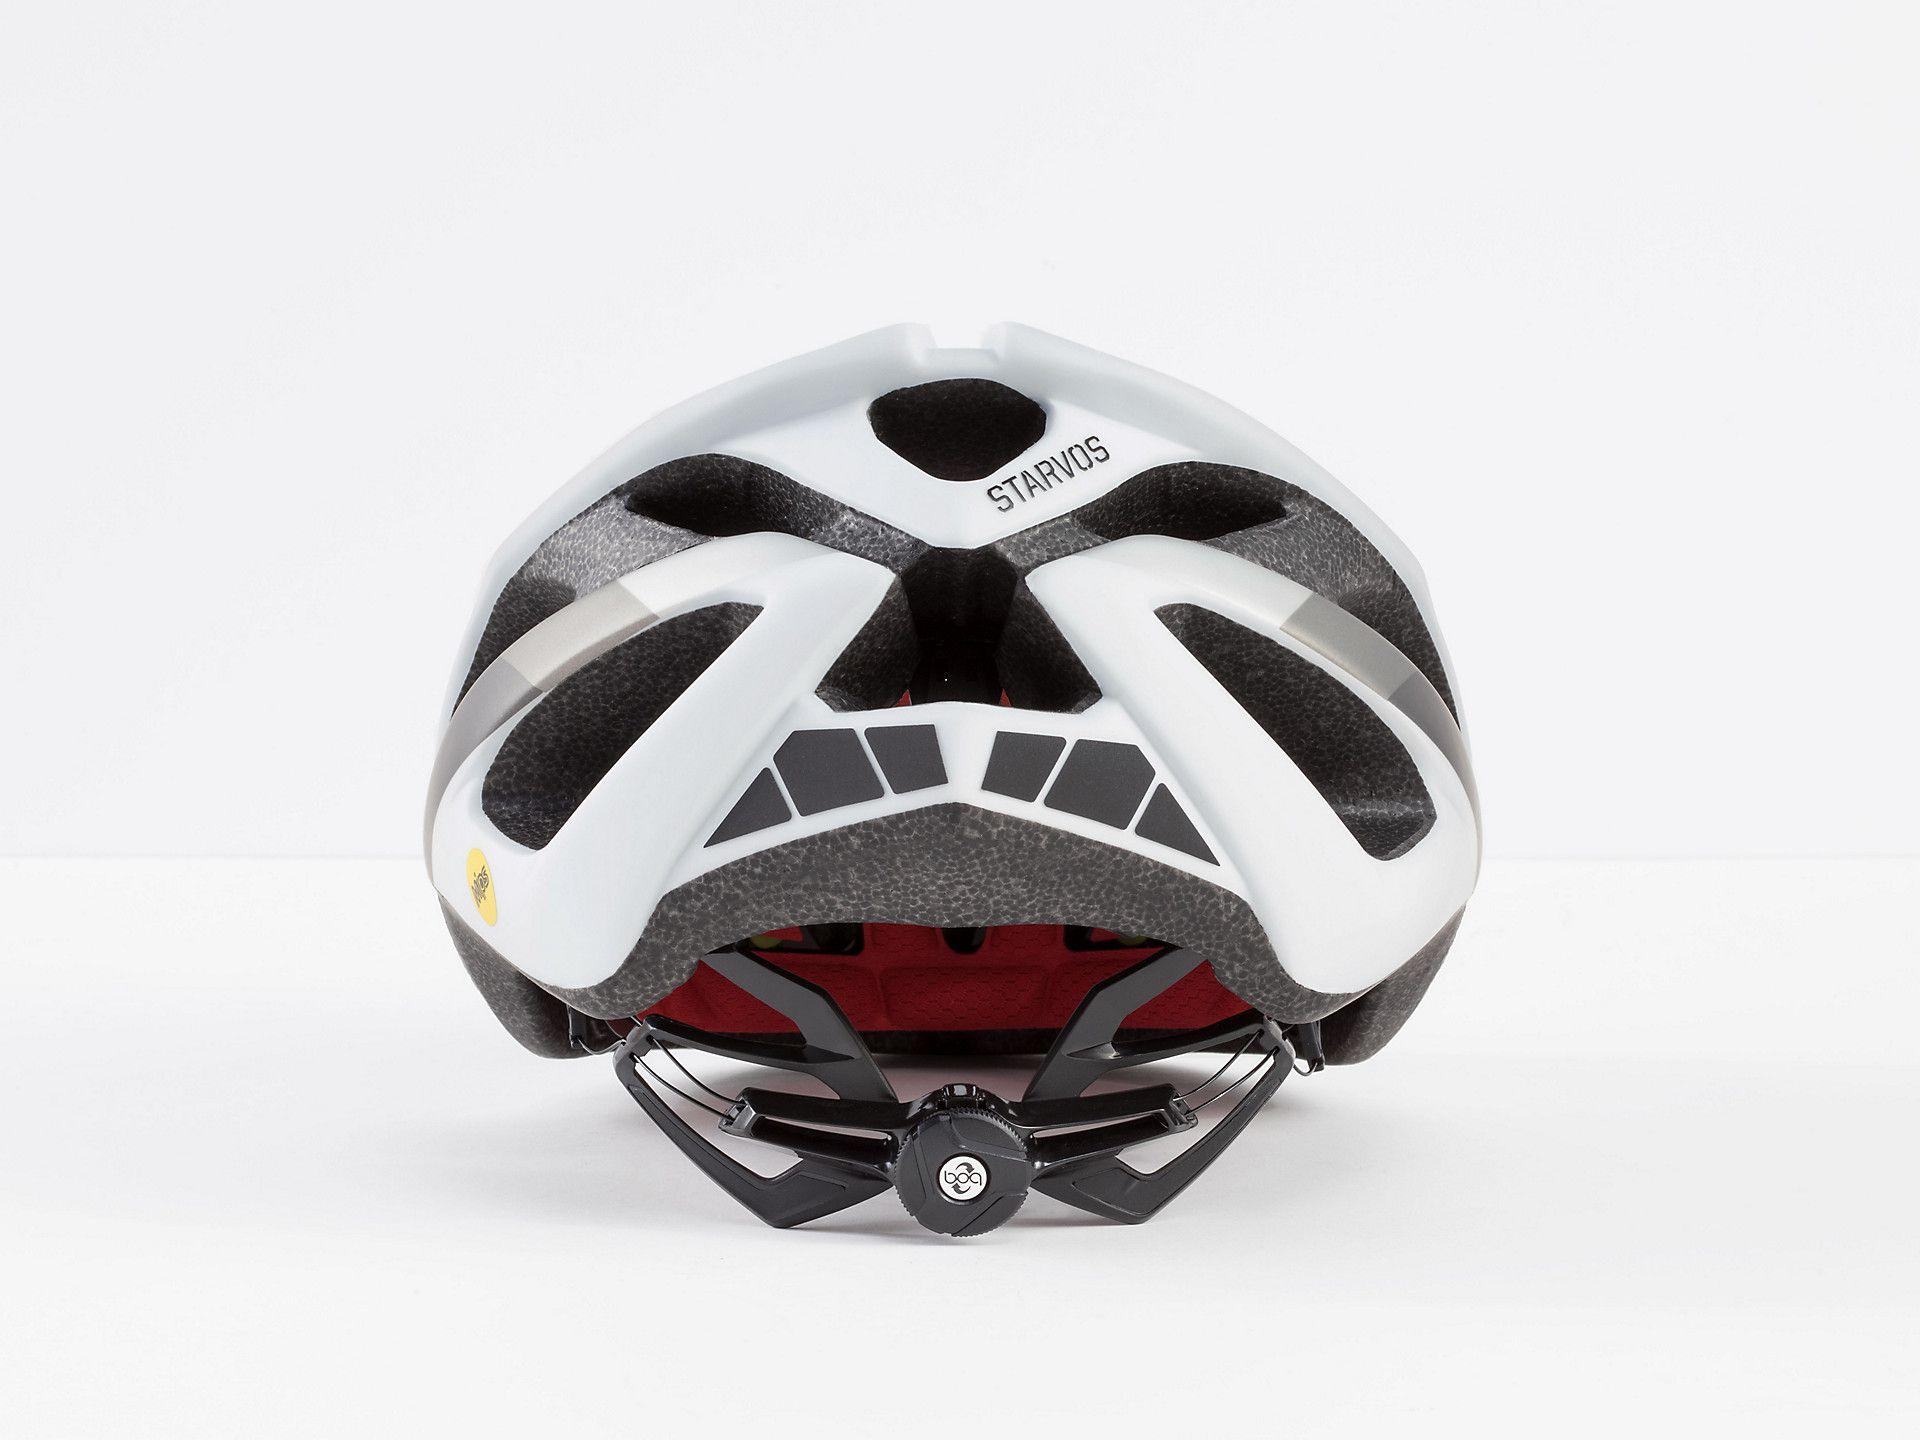 Capacete Ciclismo Starvos Com MIPS Bontrager